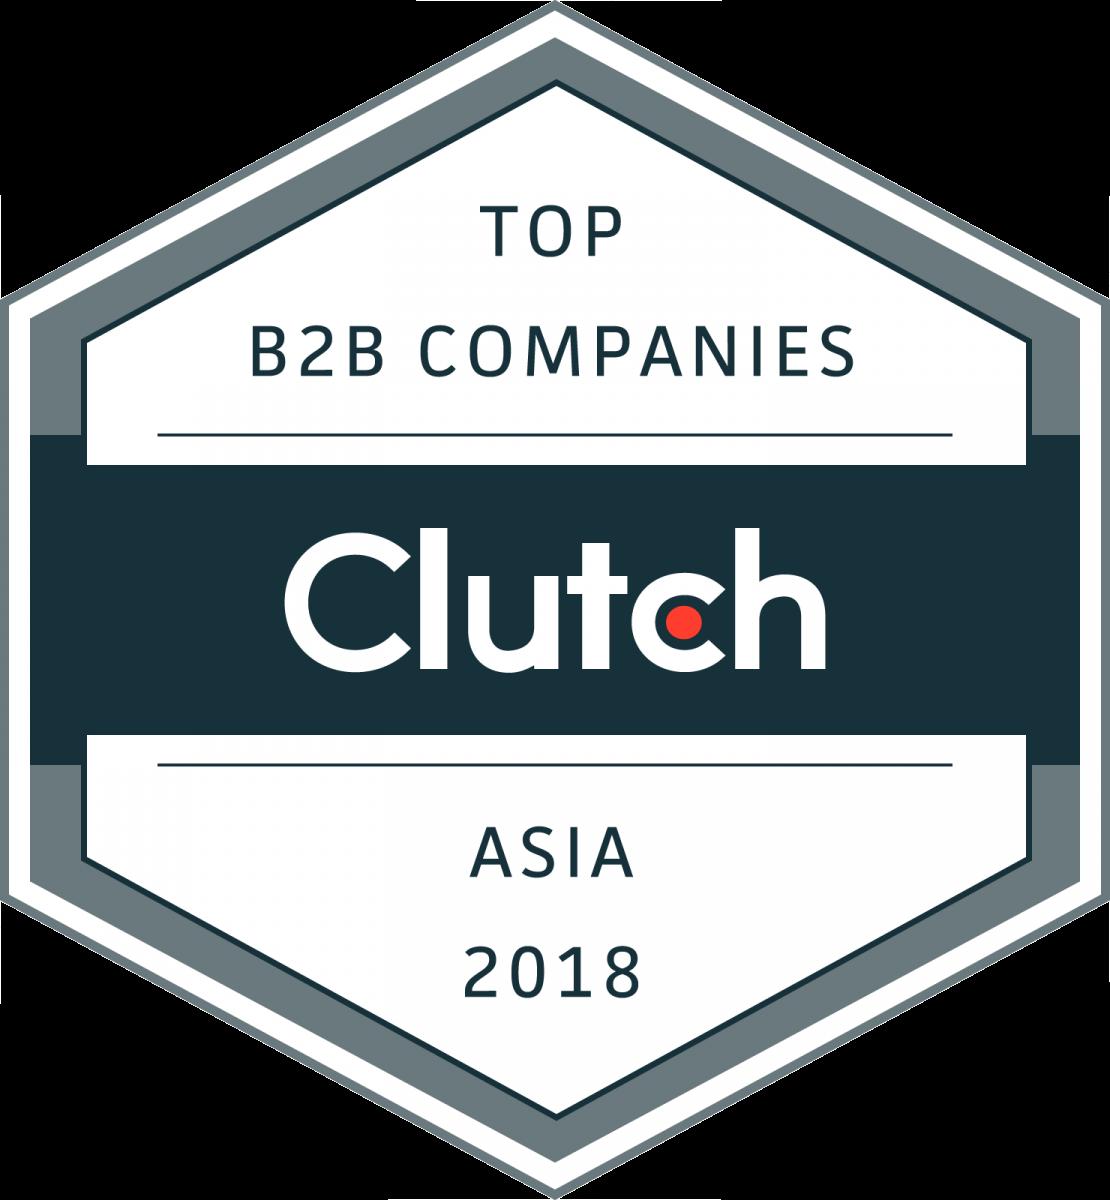 clutch_b2b_companies_asia_2018_2.png